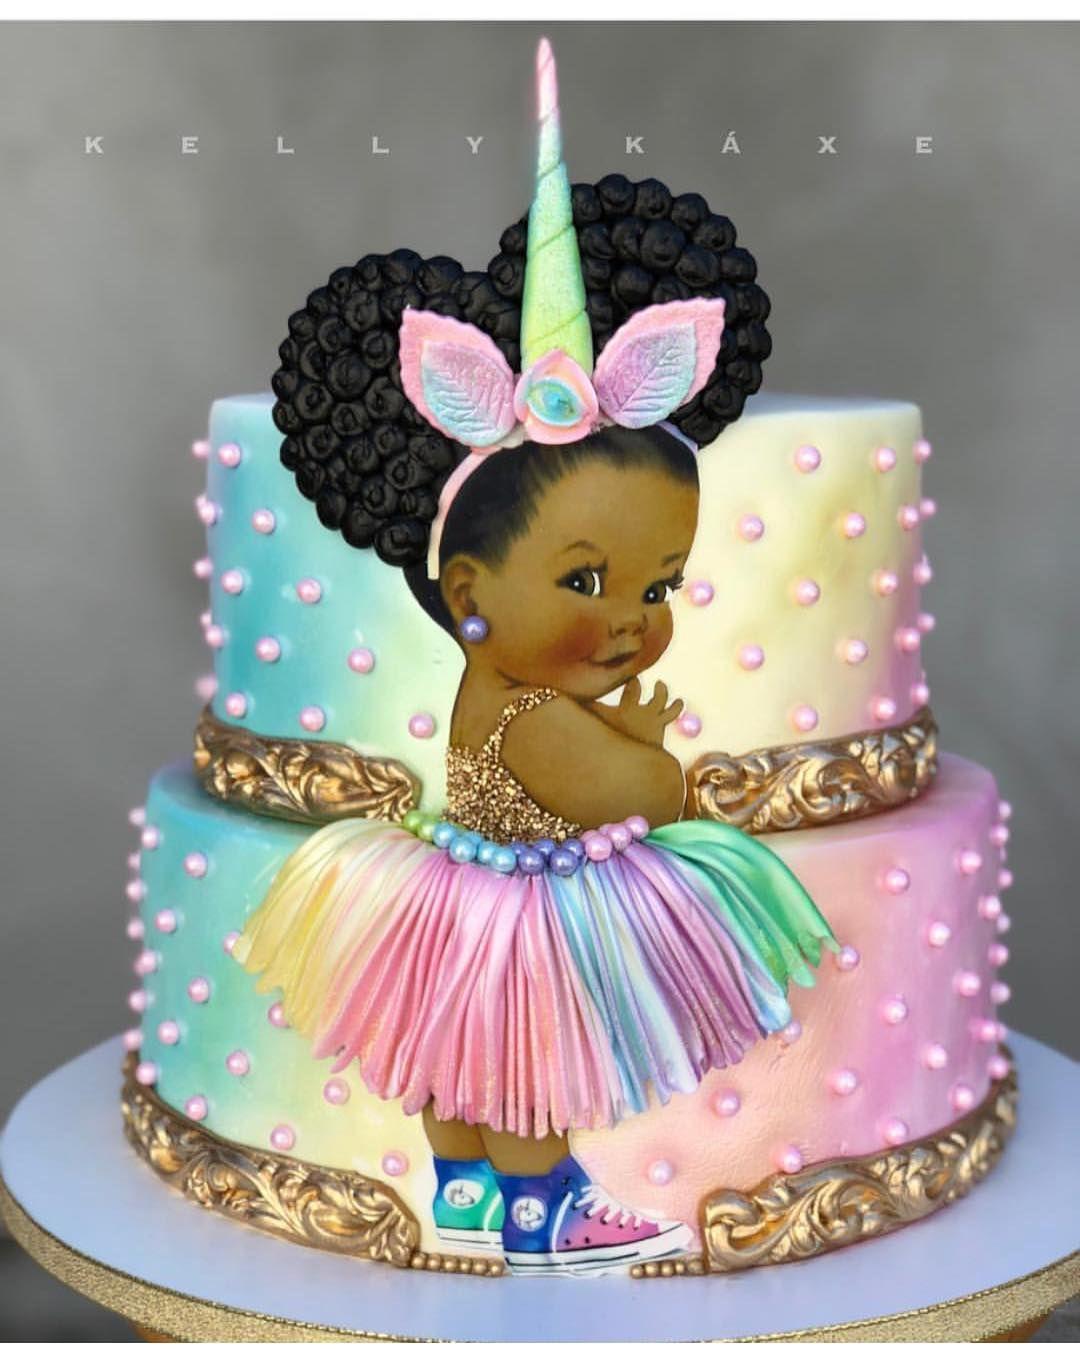 Pin By Janet Bolenbaugh On Pretty Cakes Pinterest Cake